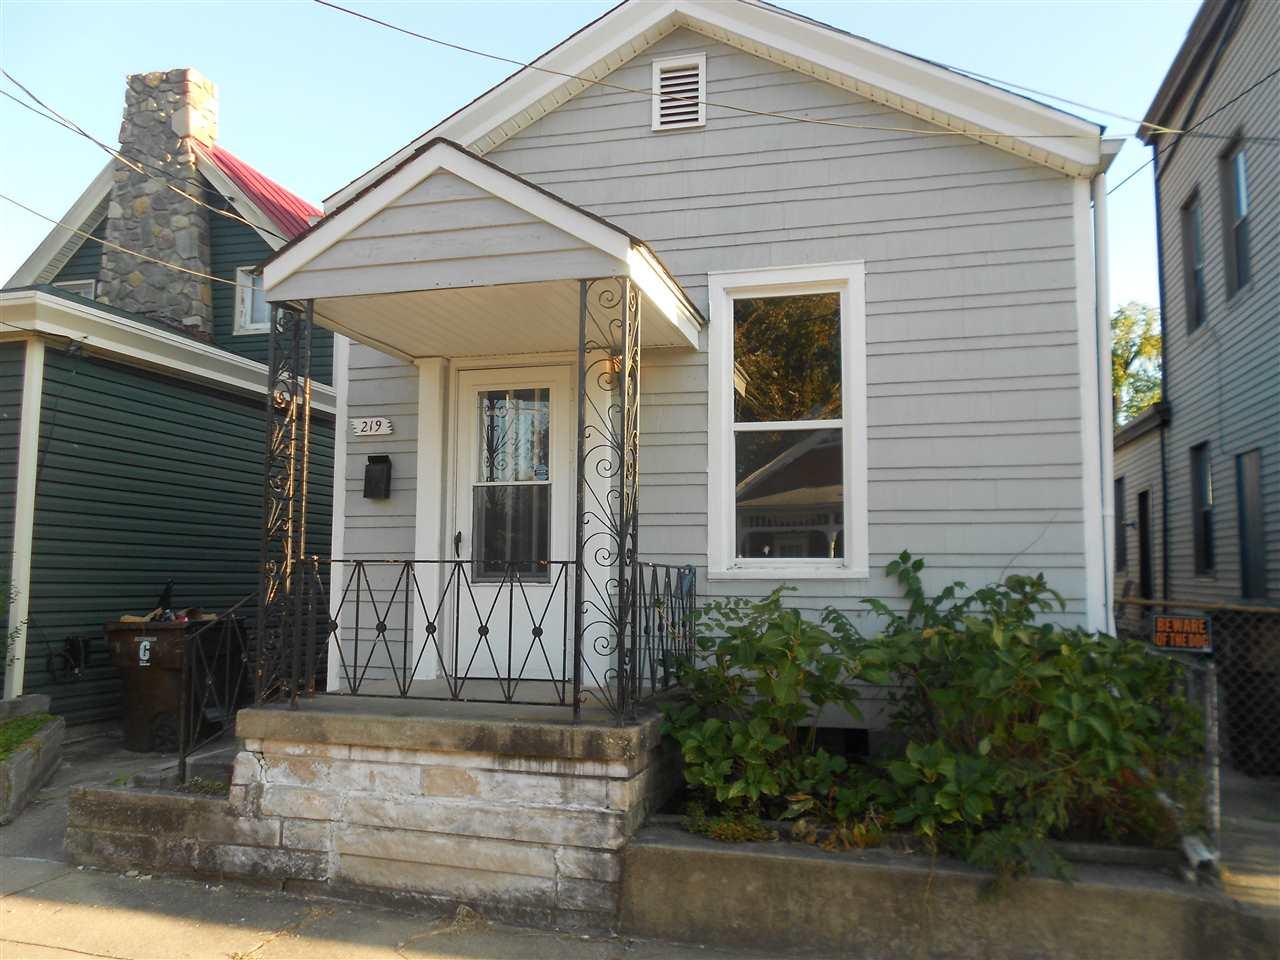 219 W 20th Street Covington KY